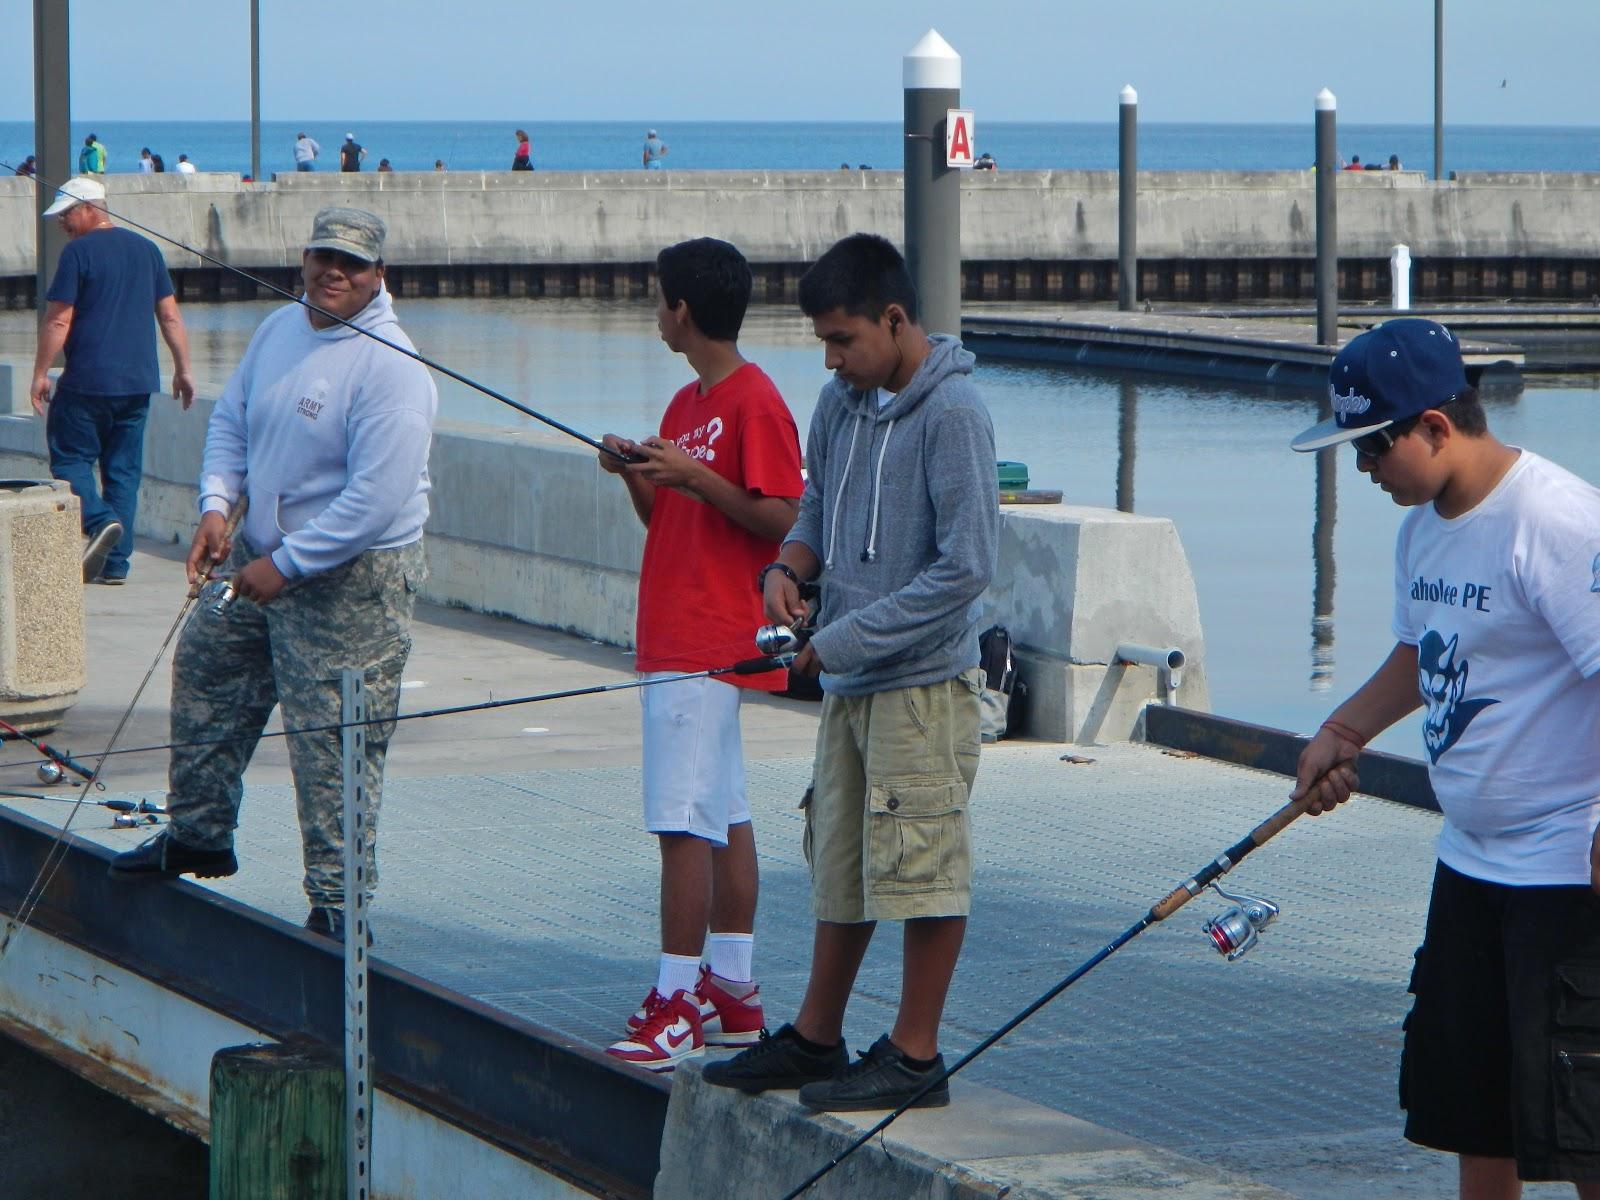 Florida fishing academy pahokee kids fishing tournament for The fishing school